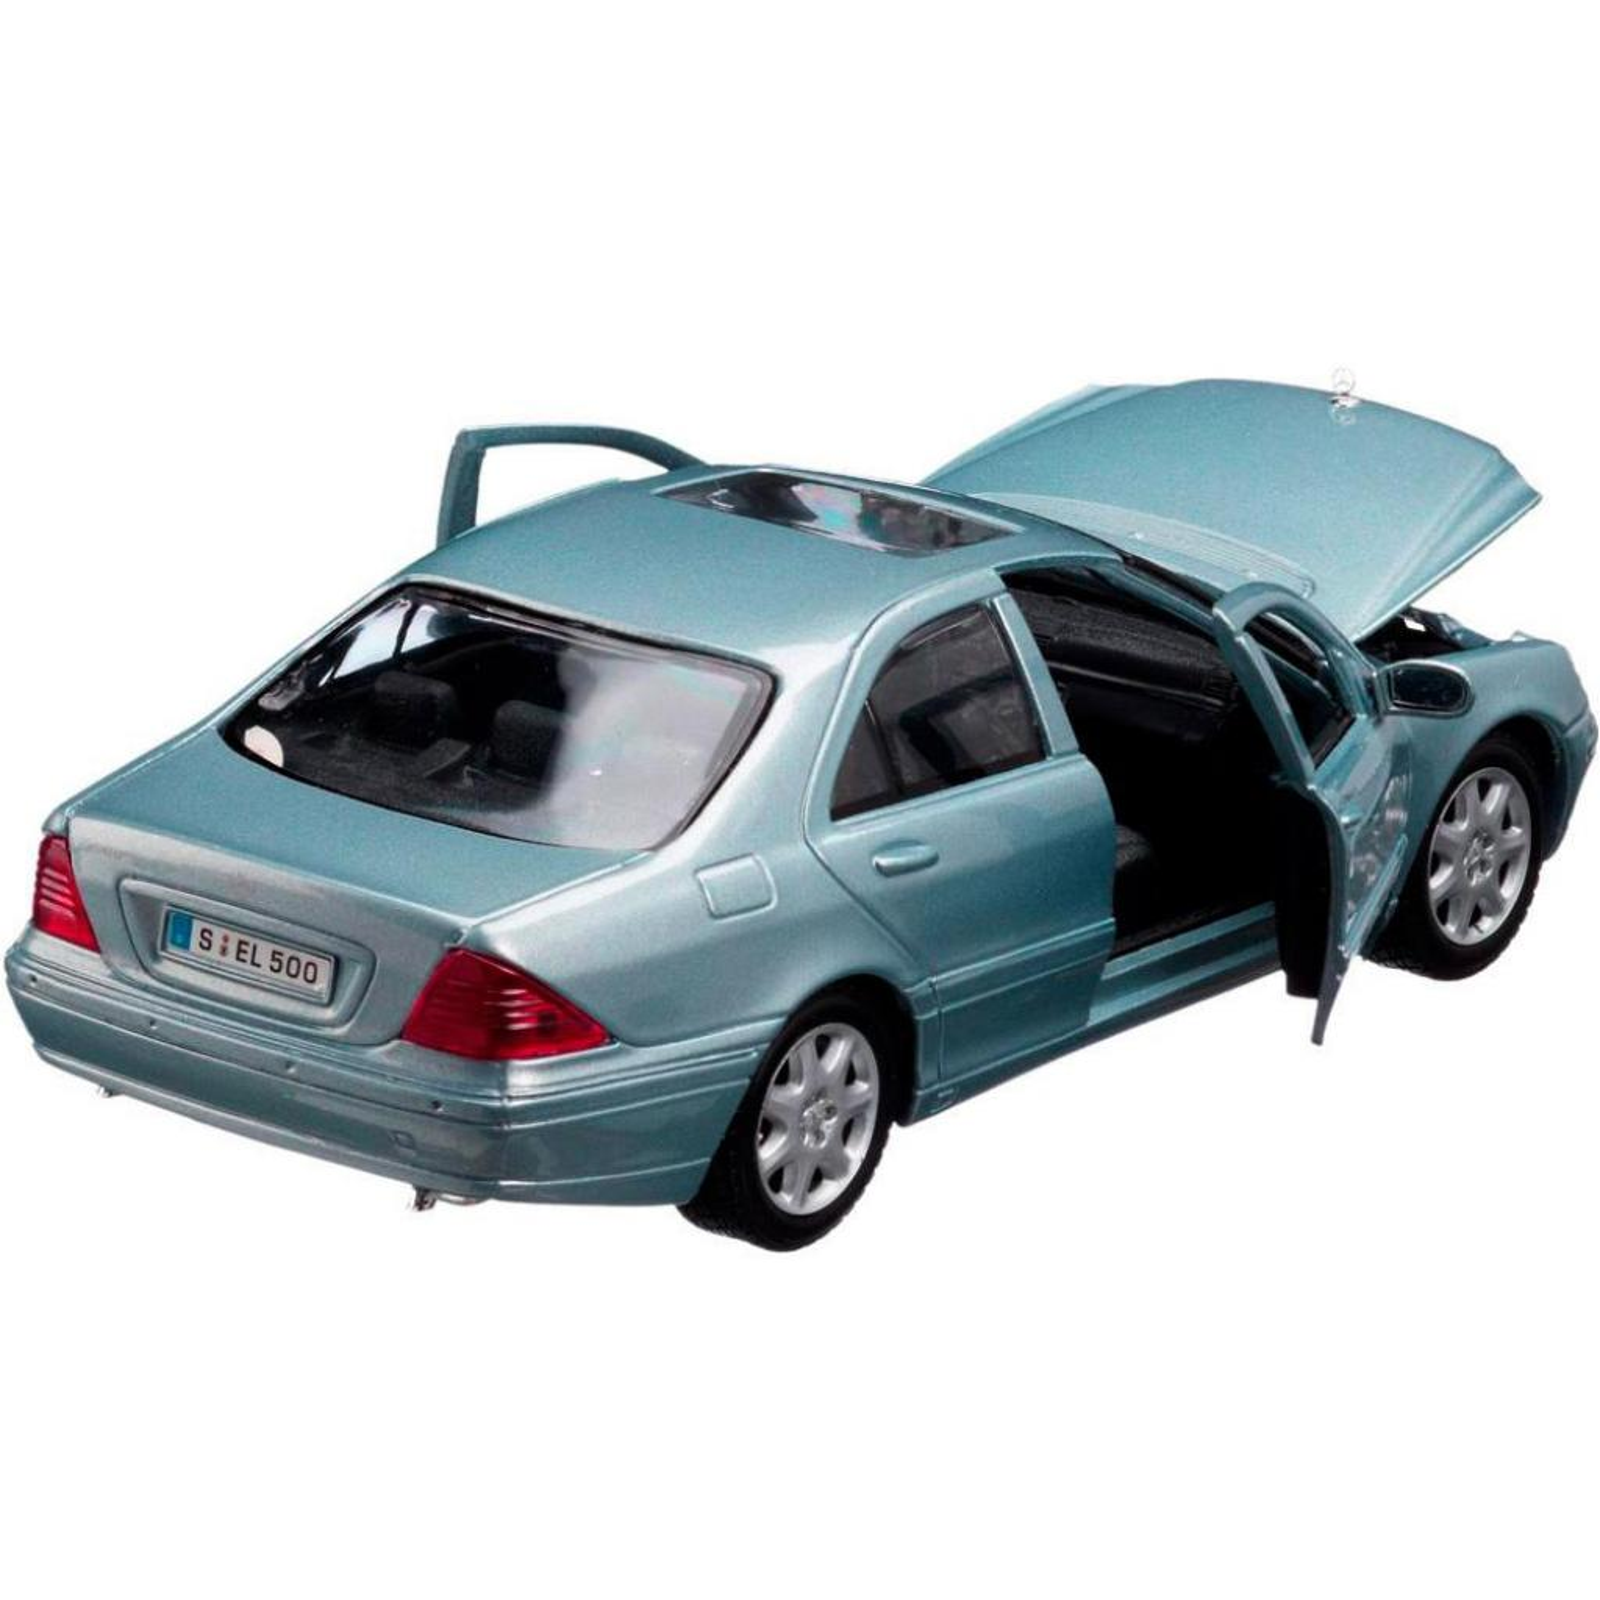 Машина Maisto Mercedes-Benz S-Class 2002 (1:26) серебристо-синий (31955 silver blue) изображение 2